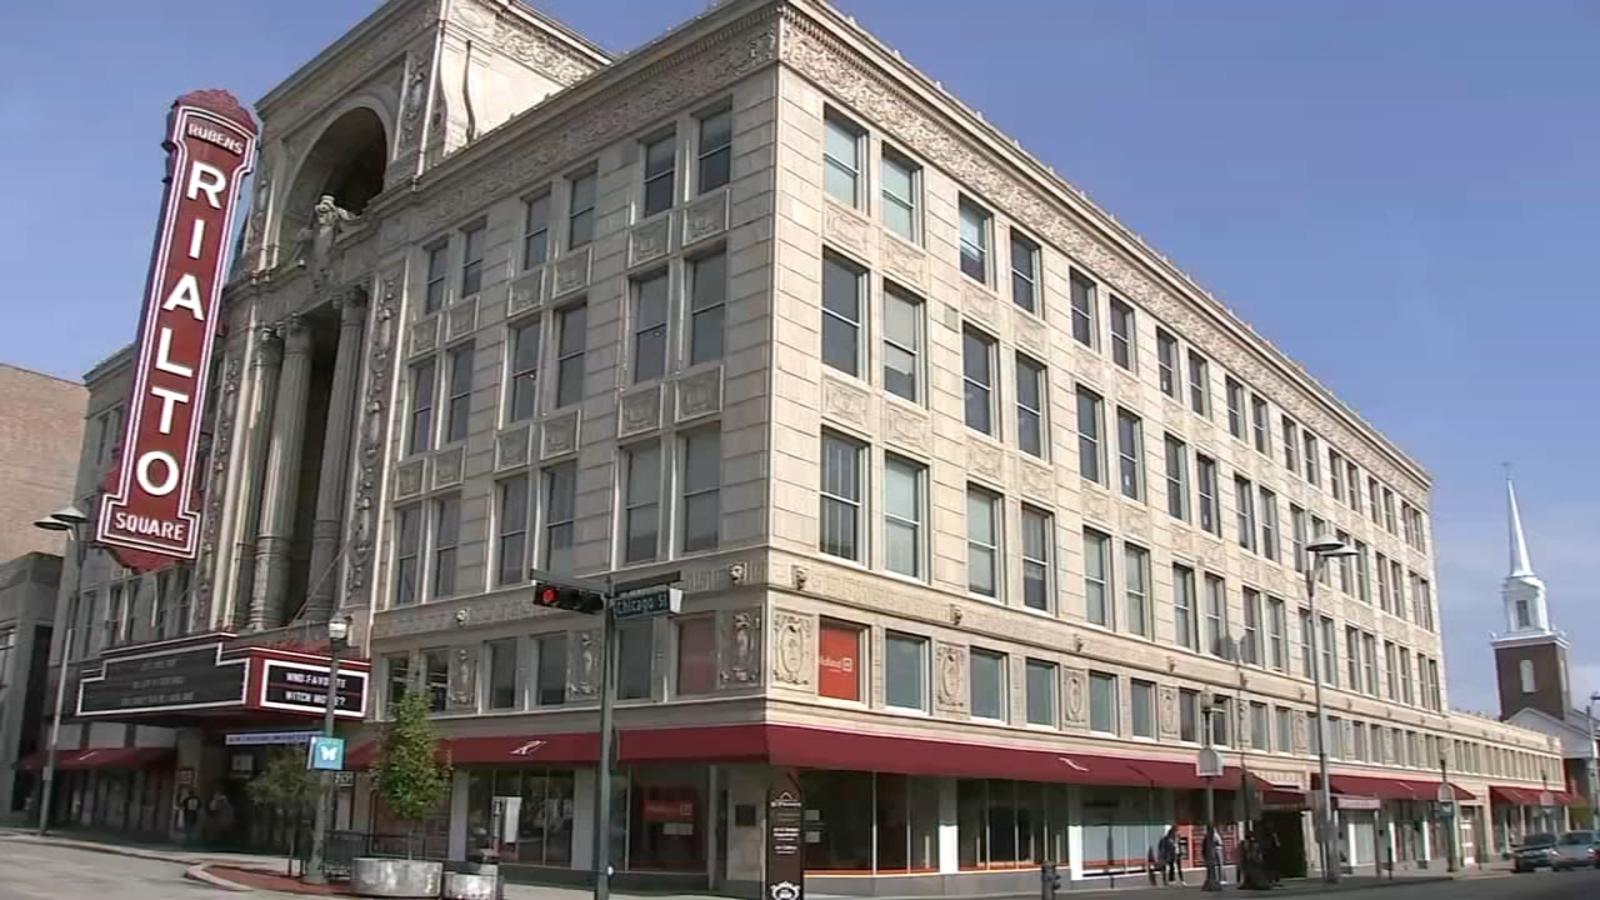 Joliet's historic Rialto Square Theatre hosting traffic court to survive COVID-19 pandemic